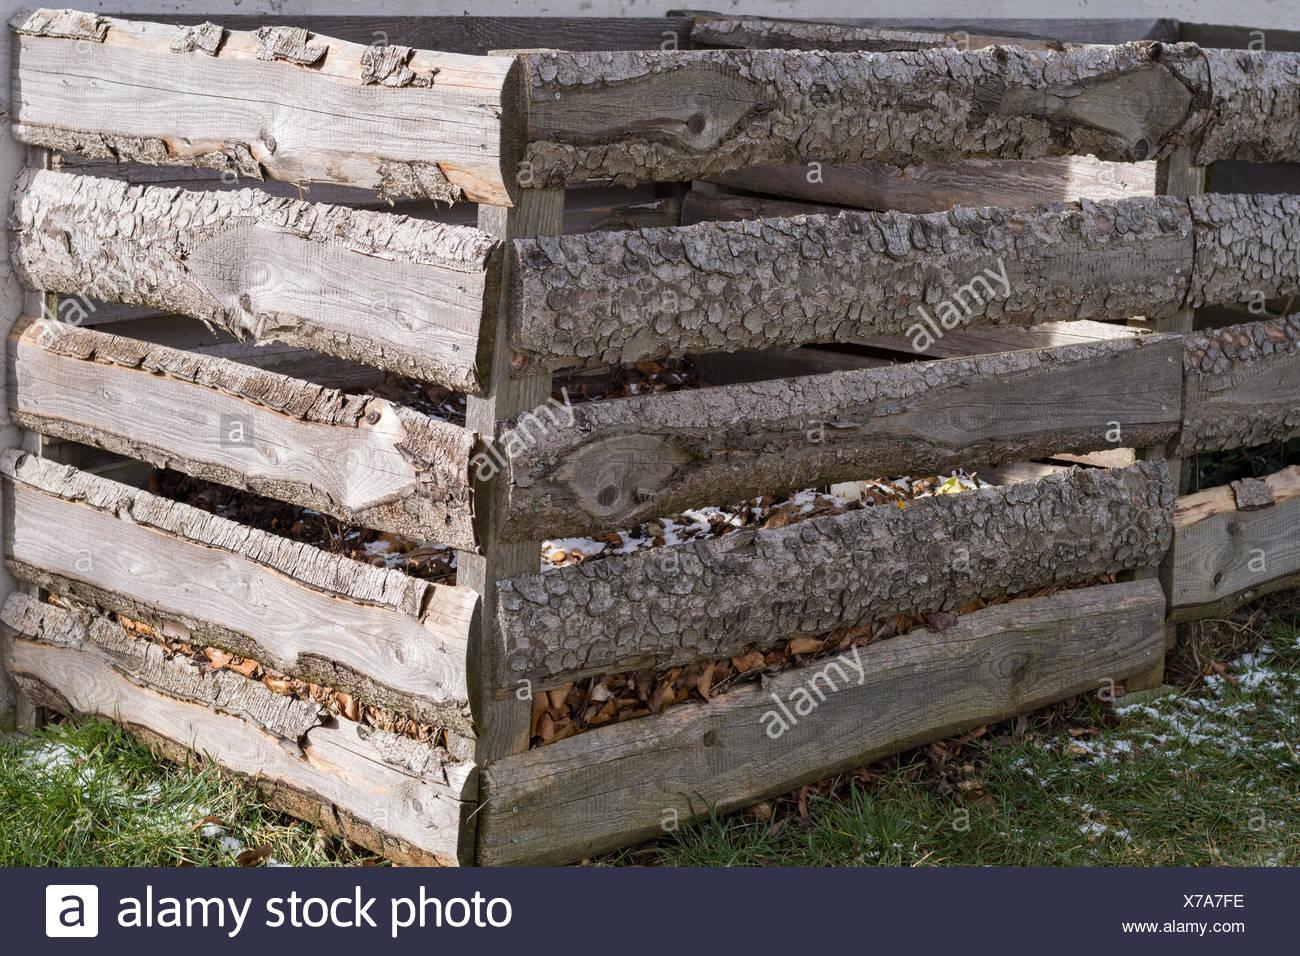 Komposter Aus Holz Stock Photos Komposter Aus Holz Stock Images